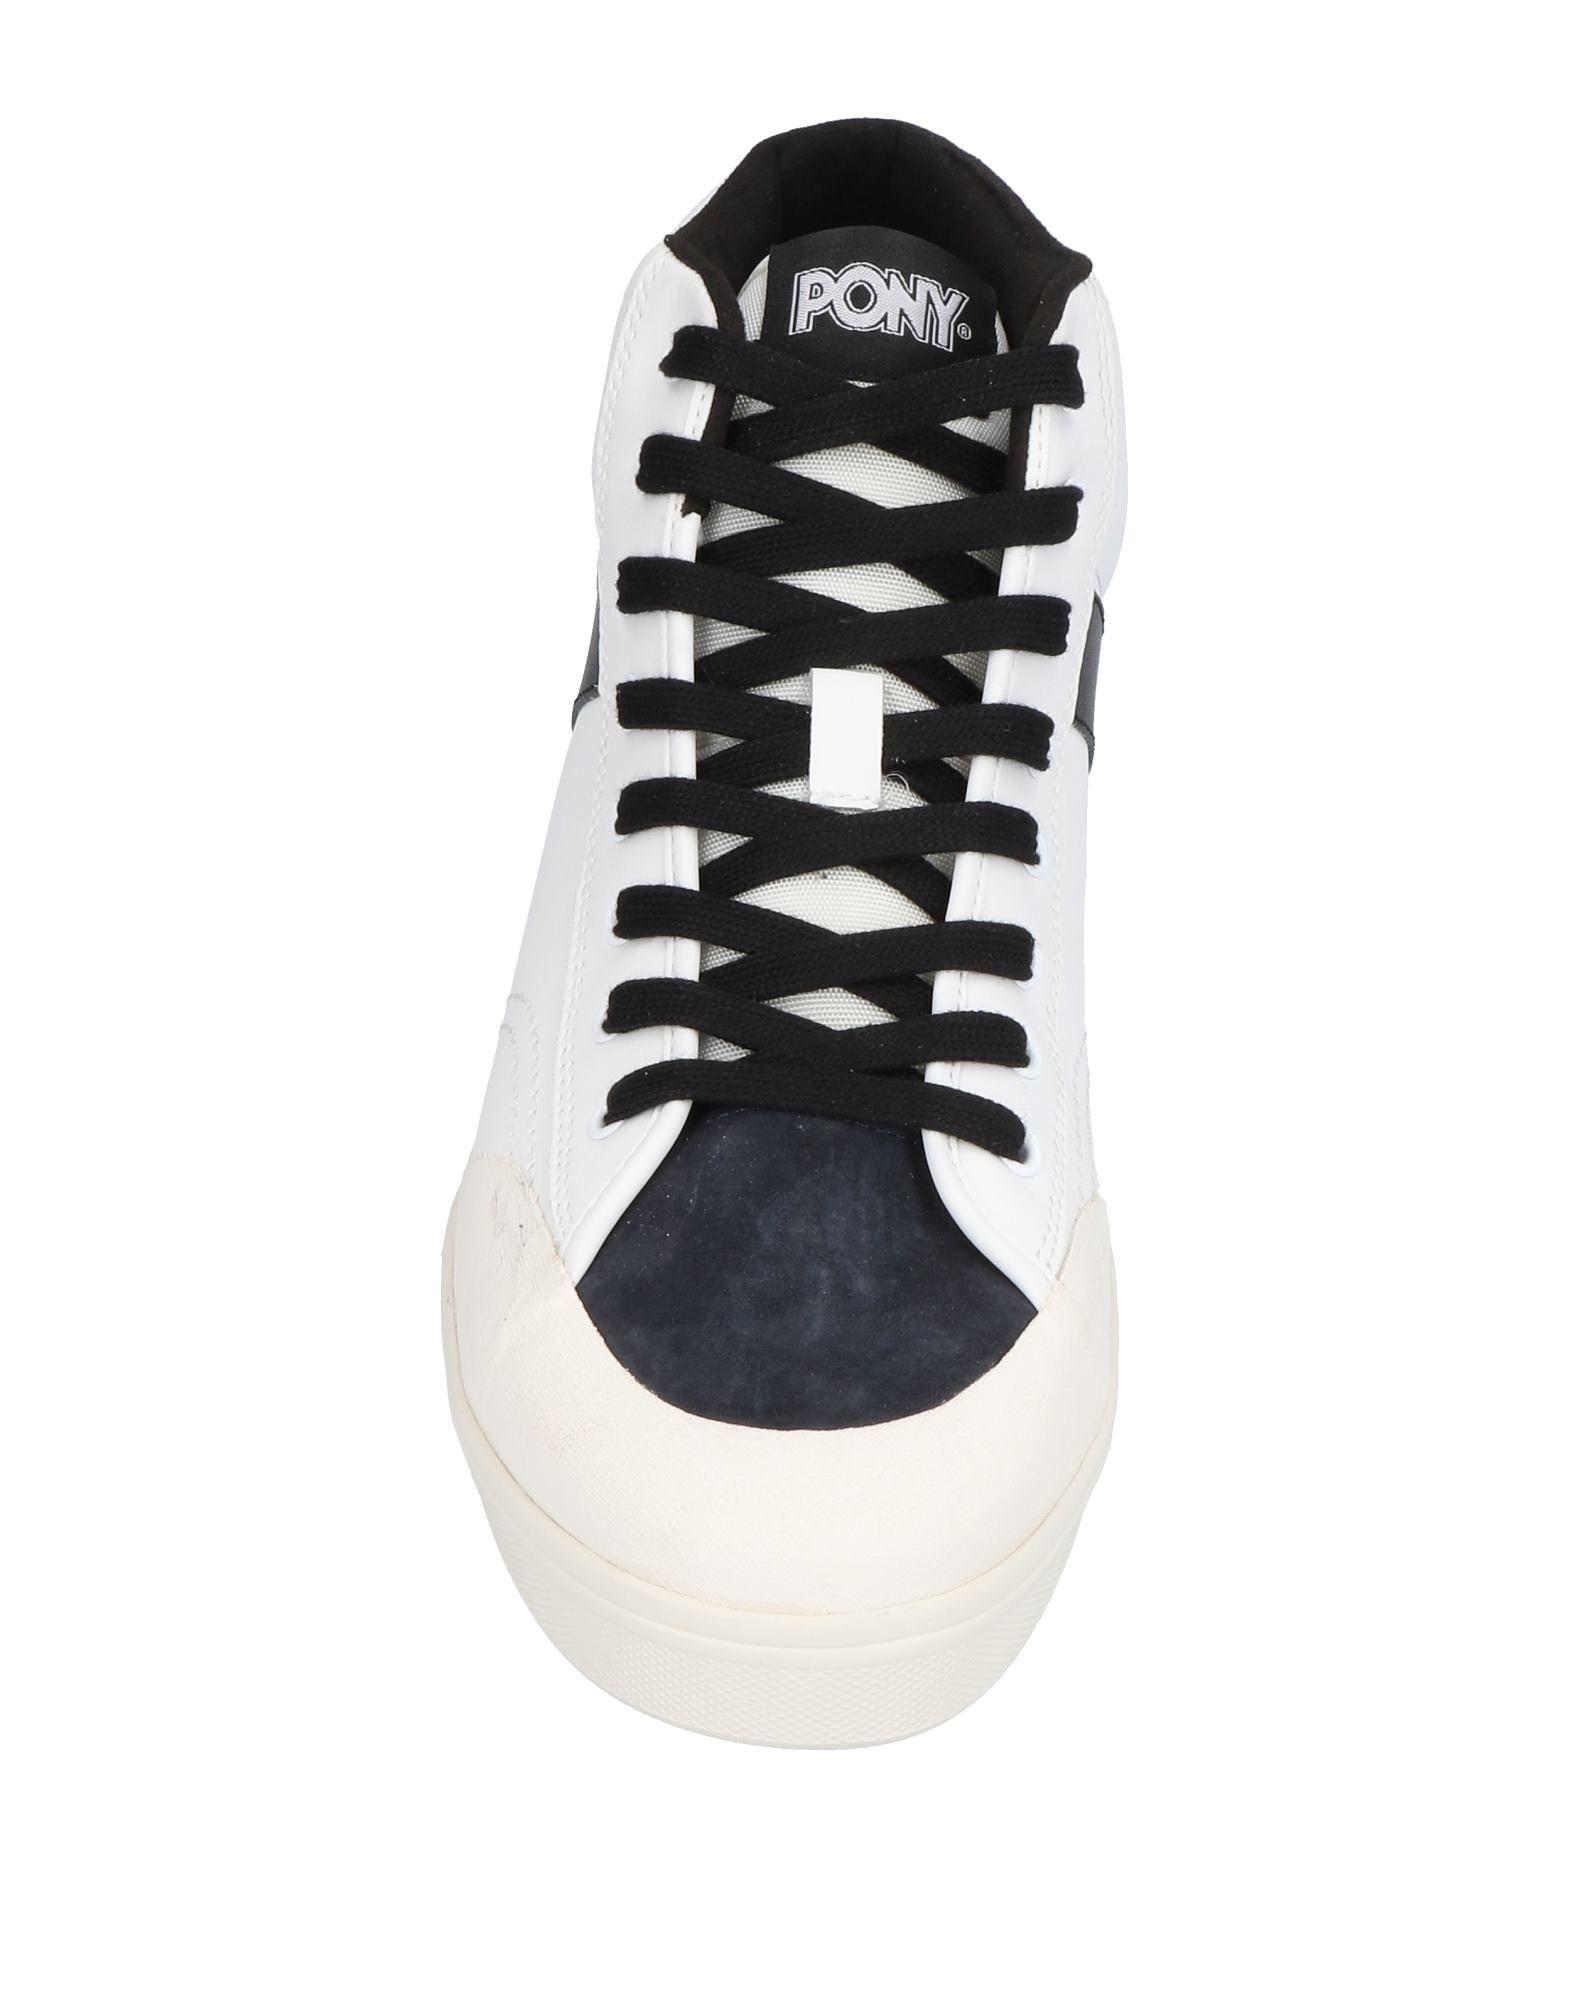 Pony Gute Sneakers Damen  11467839XK Gute Pony Qualität beliebte Schuhe 79428e